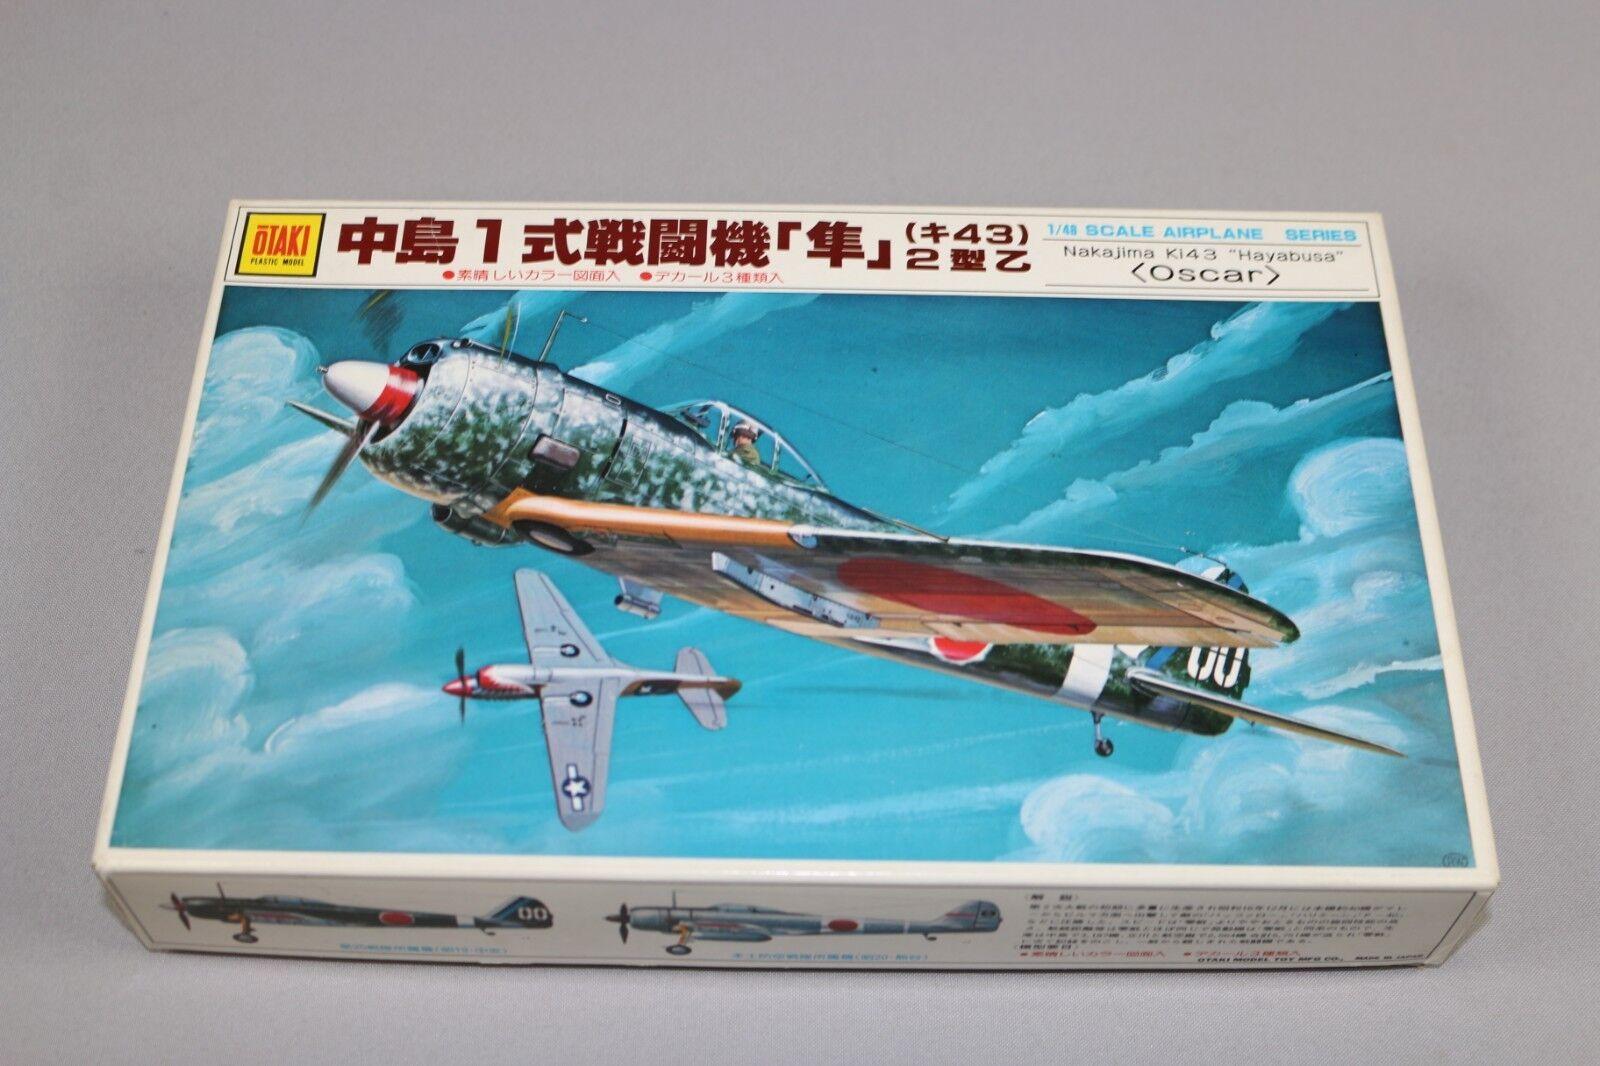 ZF605 Otaki 1 48 maquette avion 2 OT2-5-500 Nakajima Ki-43 Ki-43 Ki-43 Hayabus Oscar 123f6f